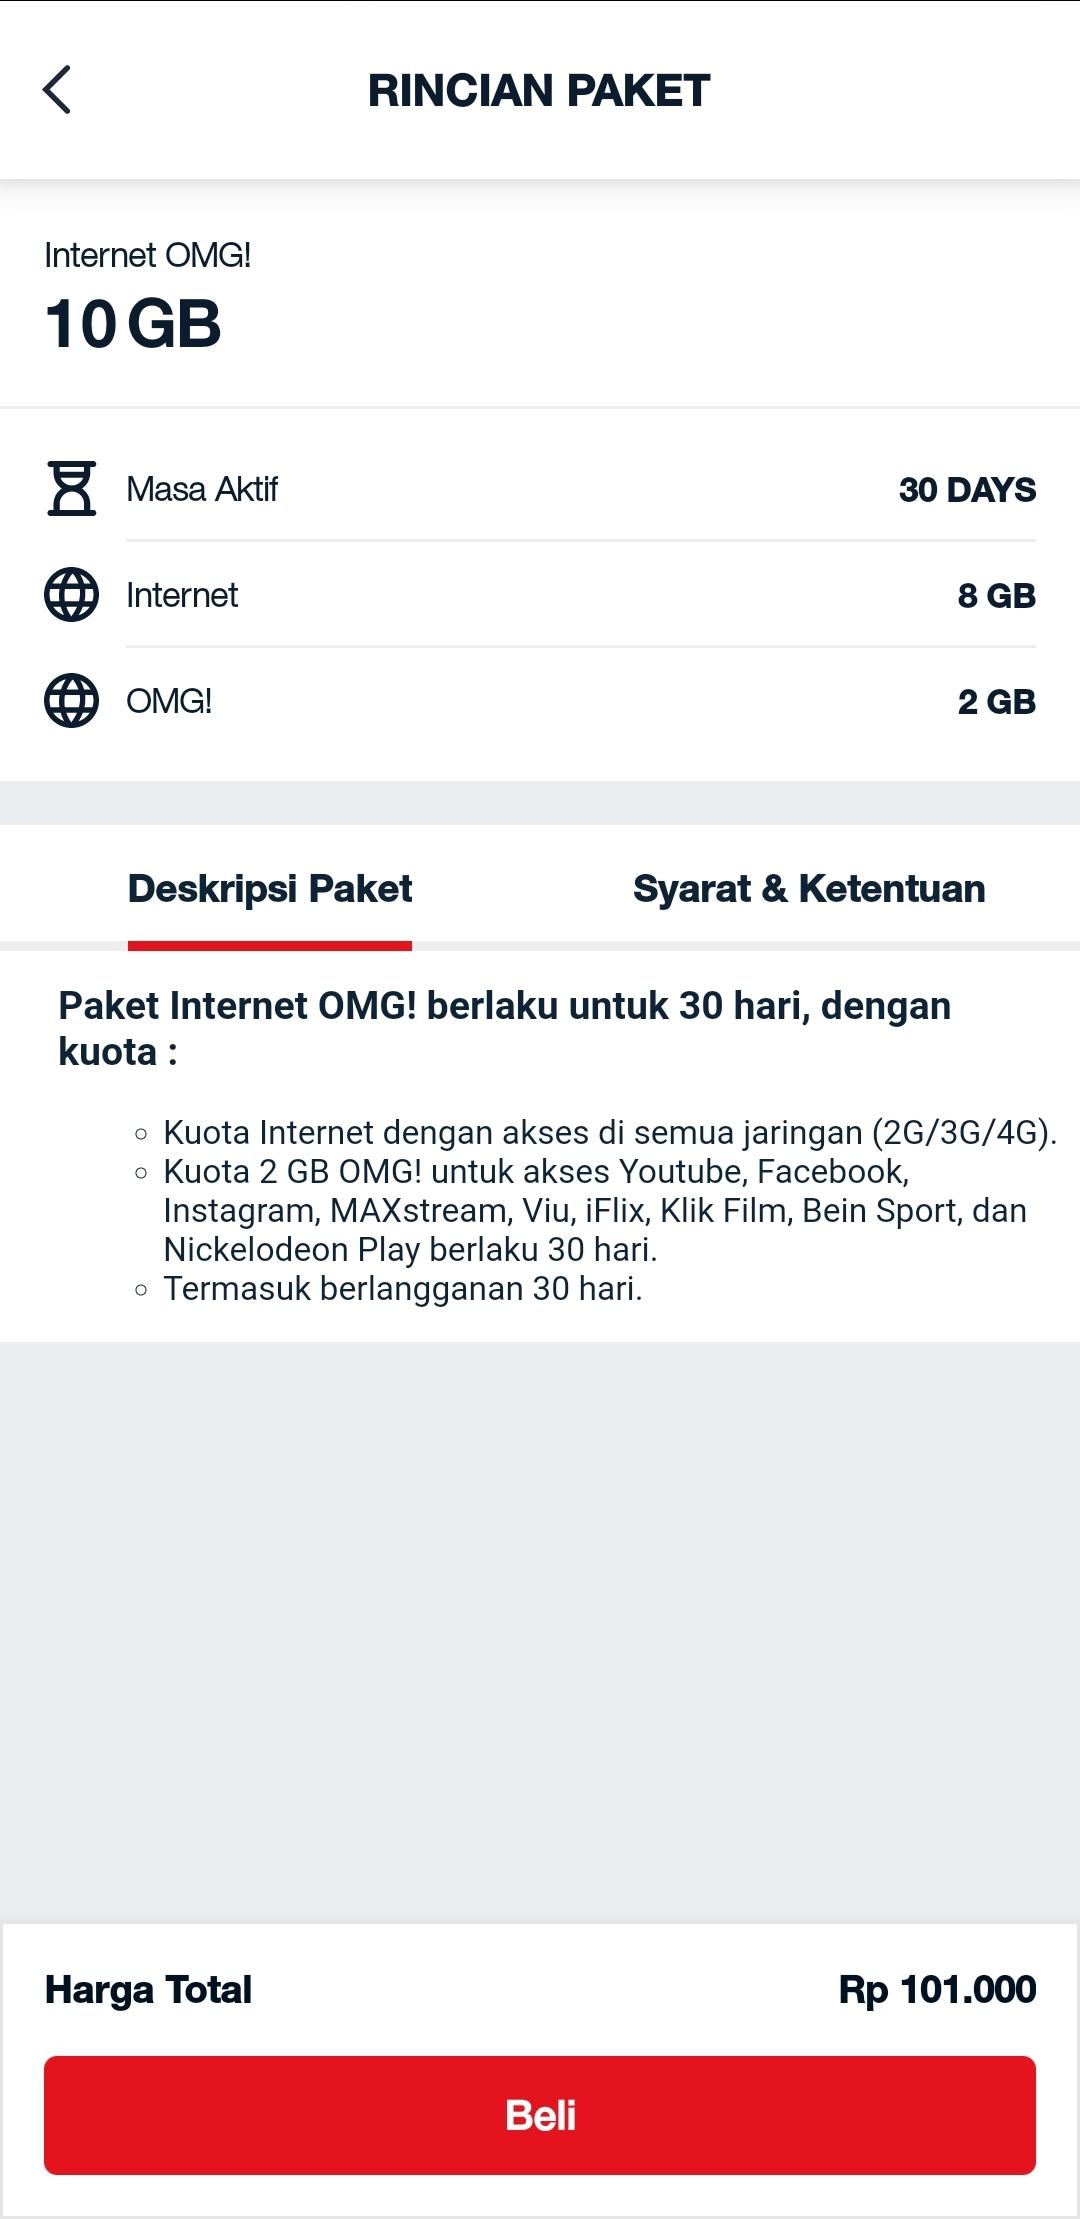 Paket Internet OMG